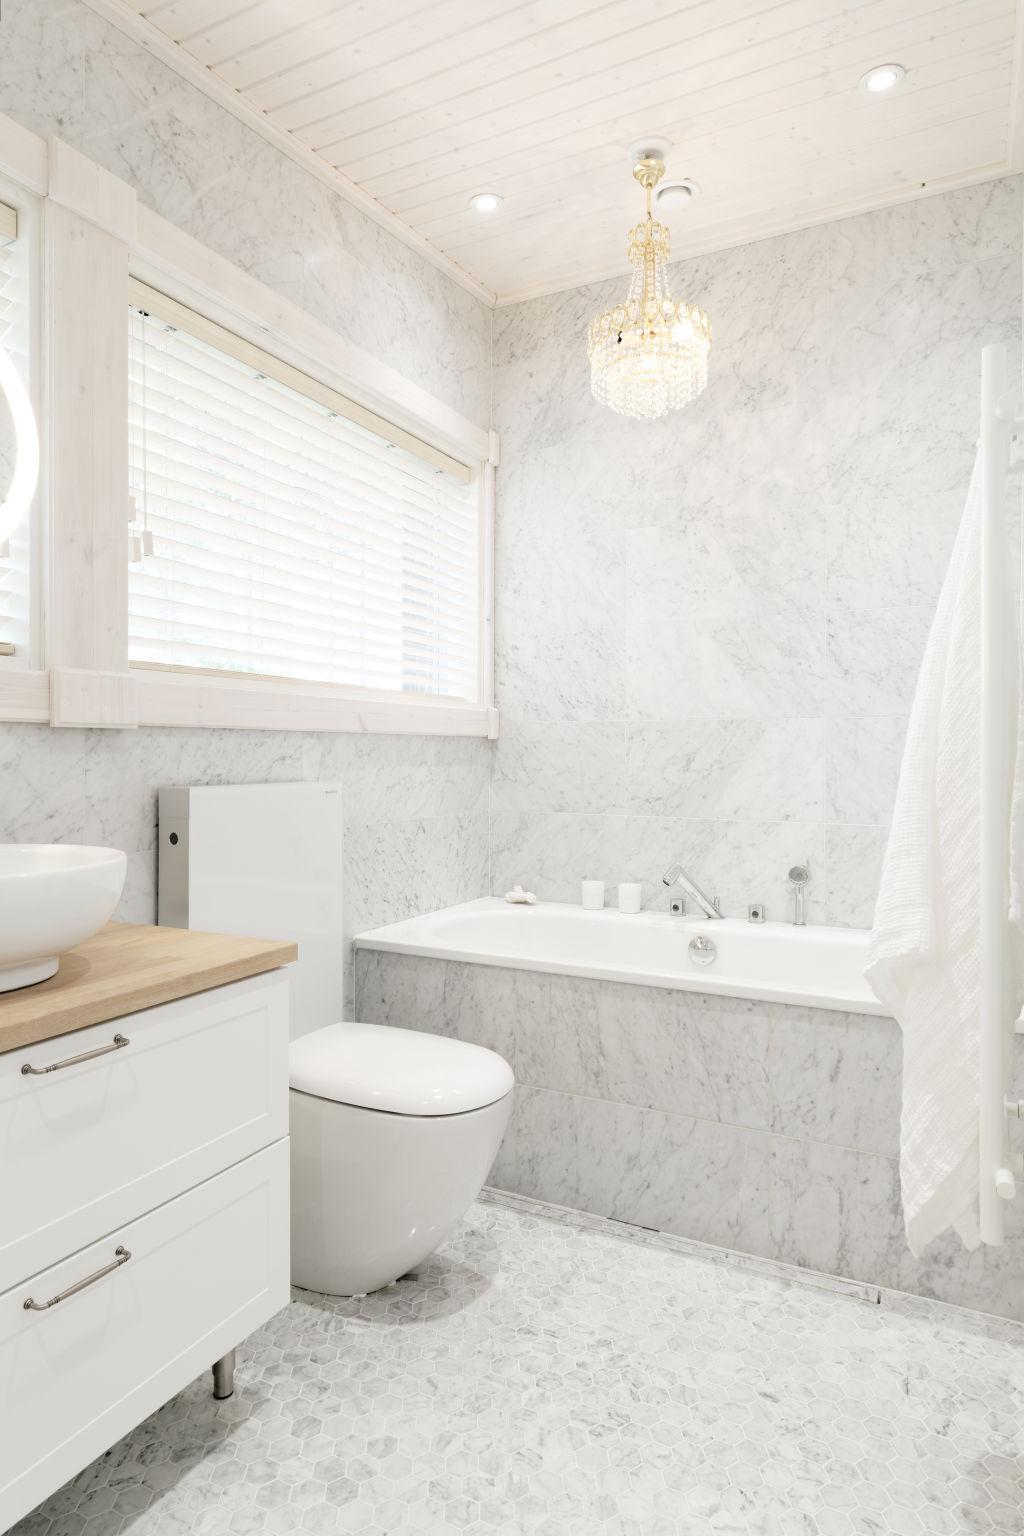 Kontio Toive Mikkeli asuntomessut kylpyhone spa sauna living Carrara marmori